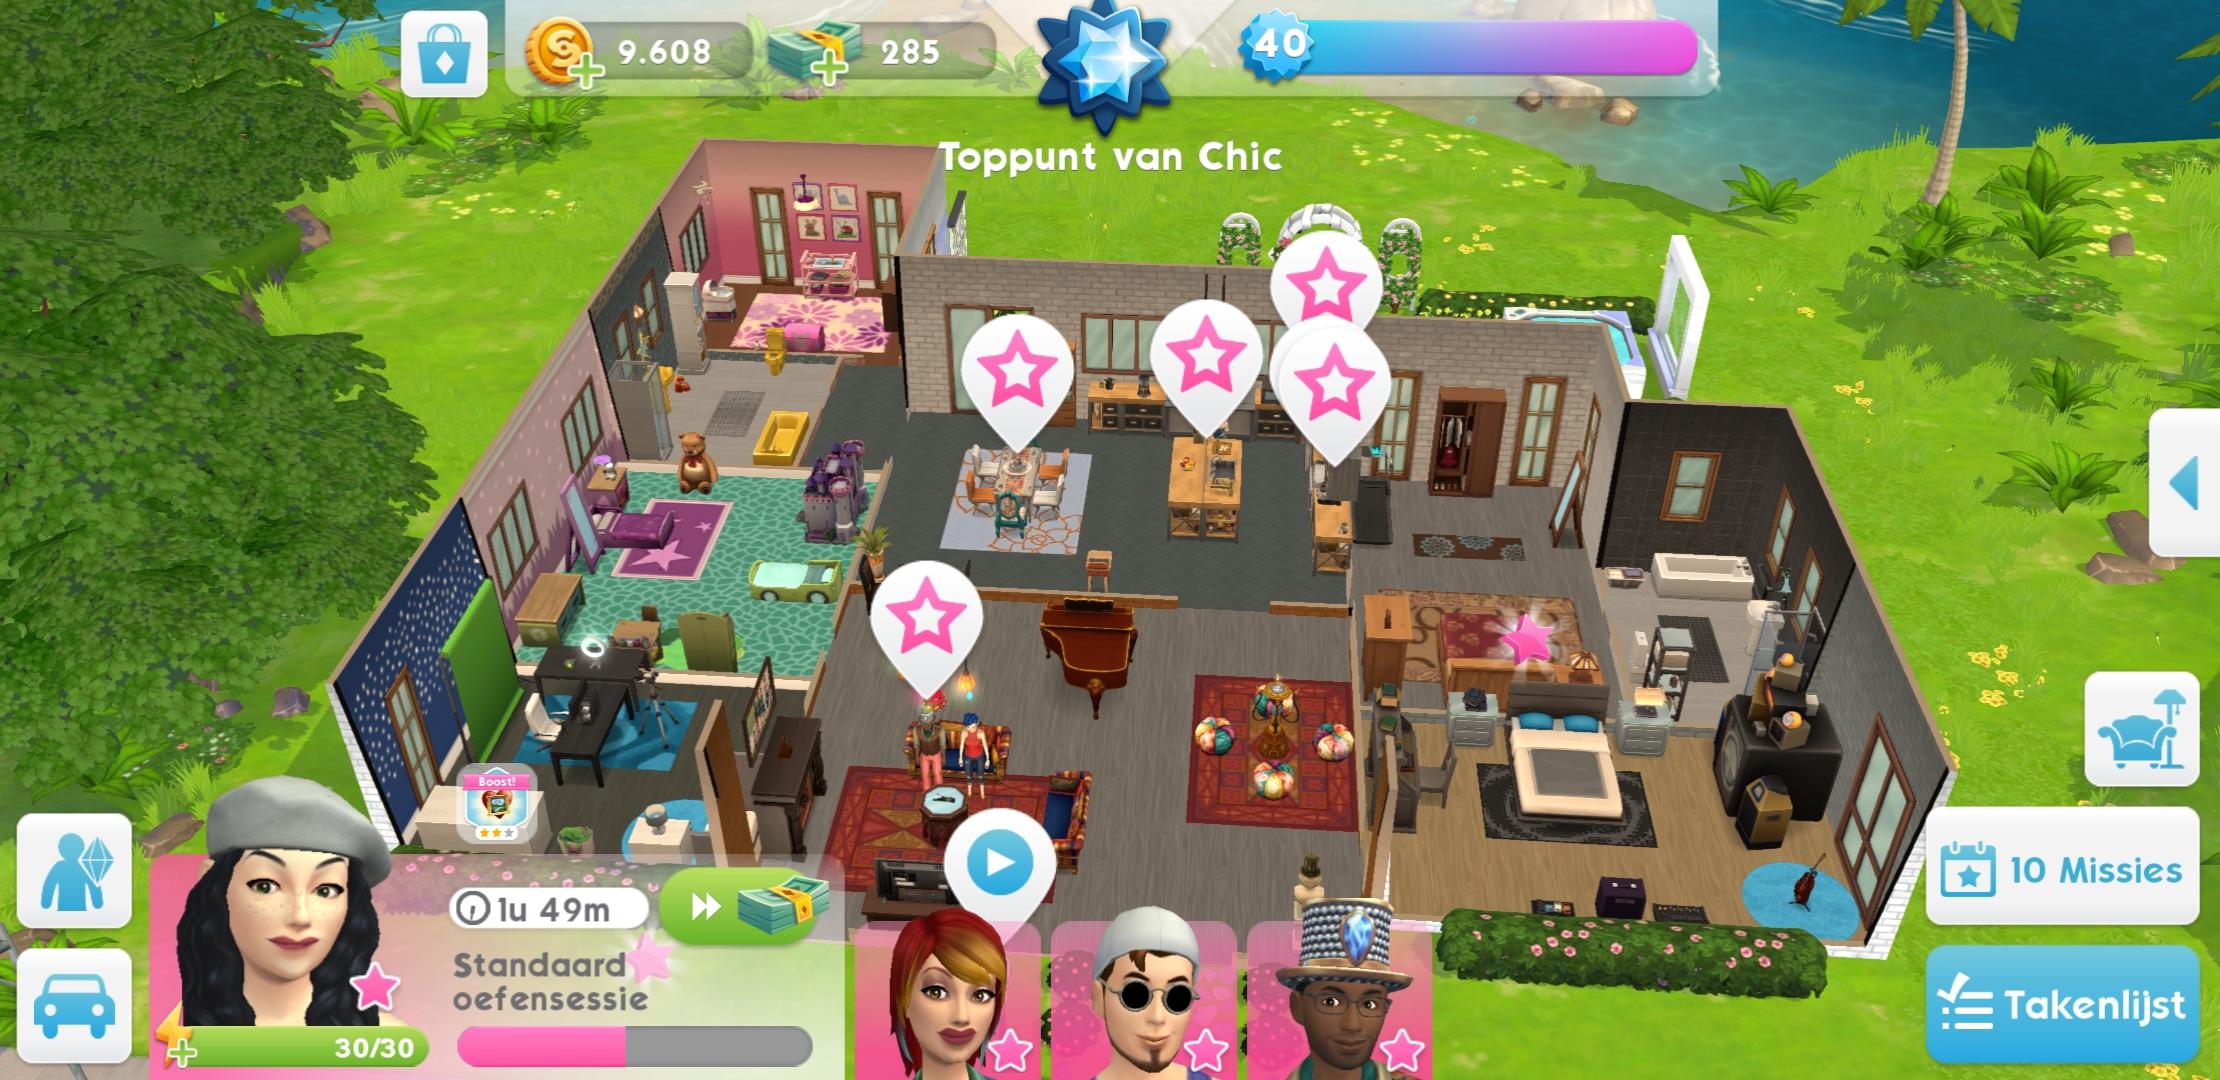 Screenshot_20180617_084842_The_Sims.jpg